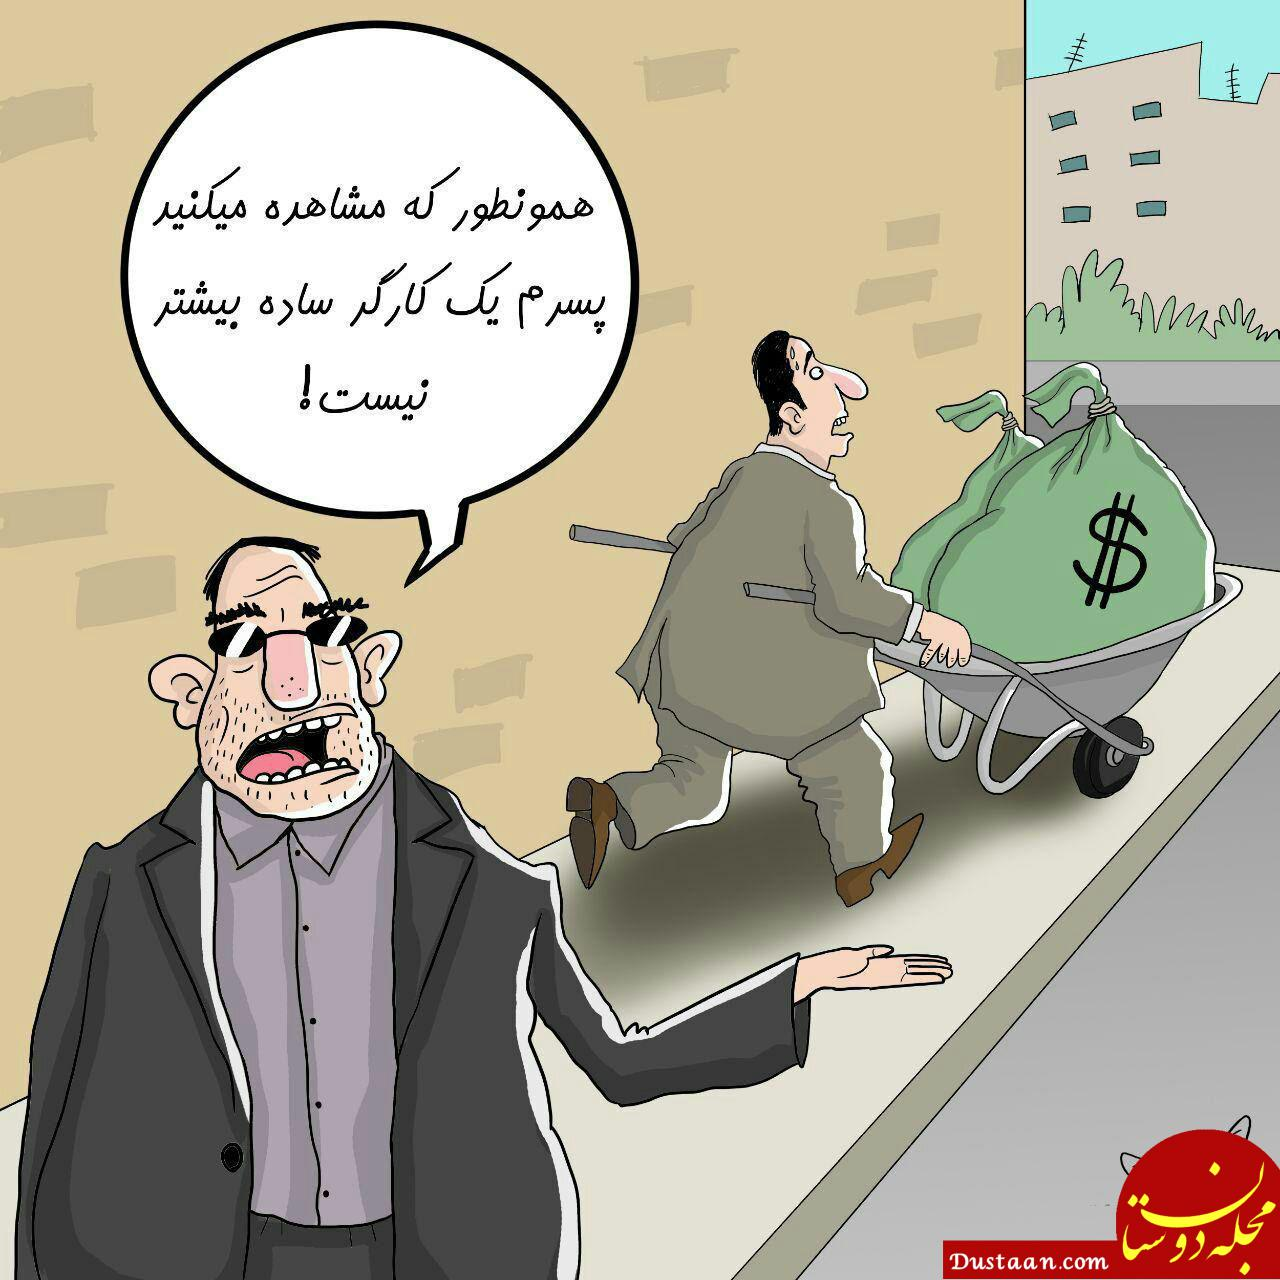 www.dustaan.com در حاشیه کمپین فرزندت کجاست! +عکس